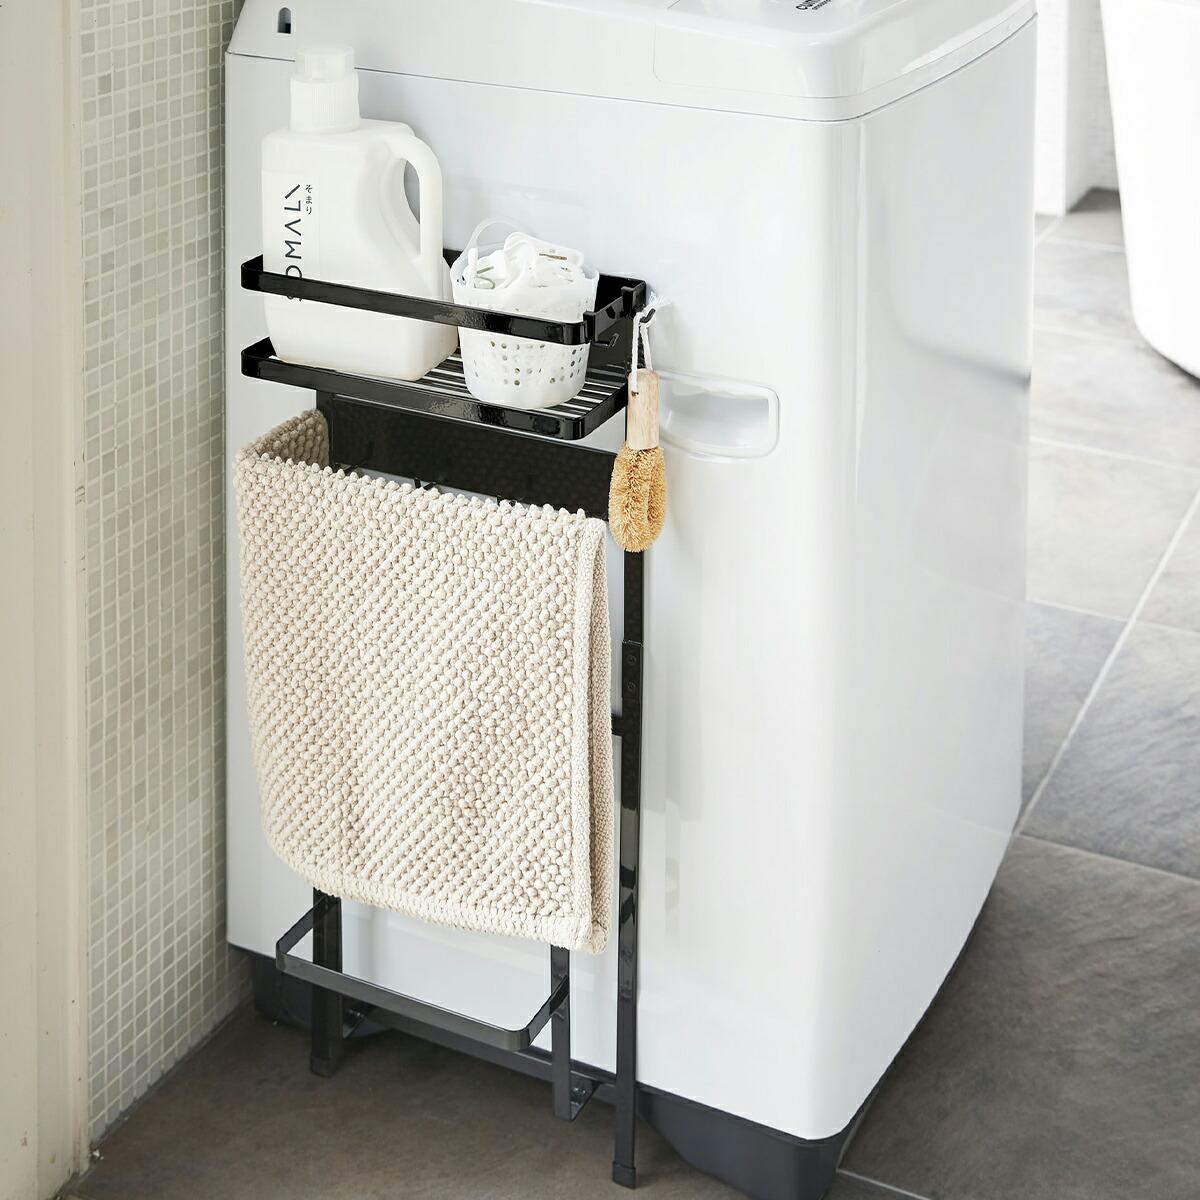 tower / タワー 洗濯機横マグネット収納ラック